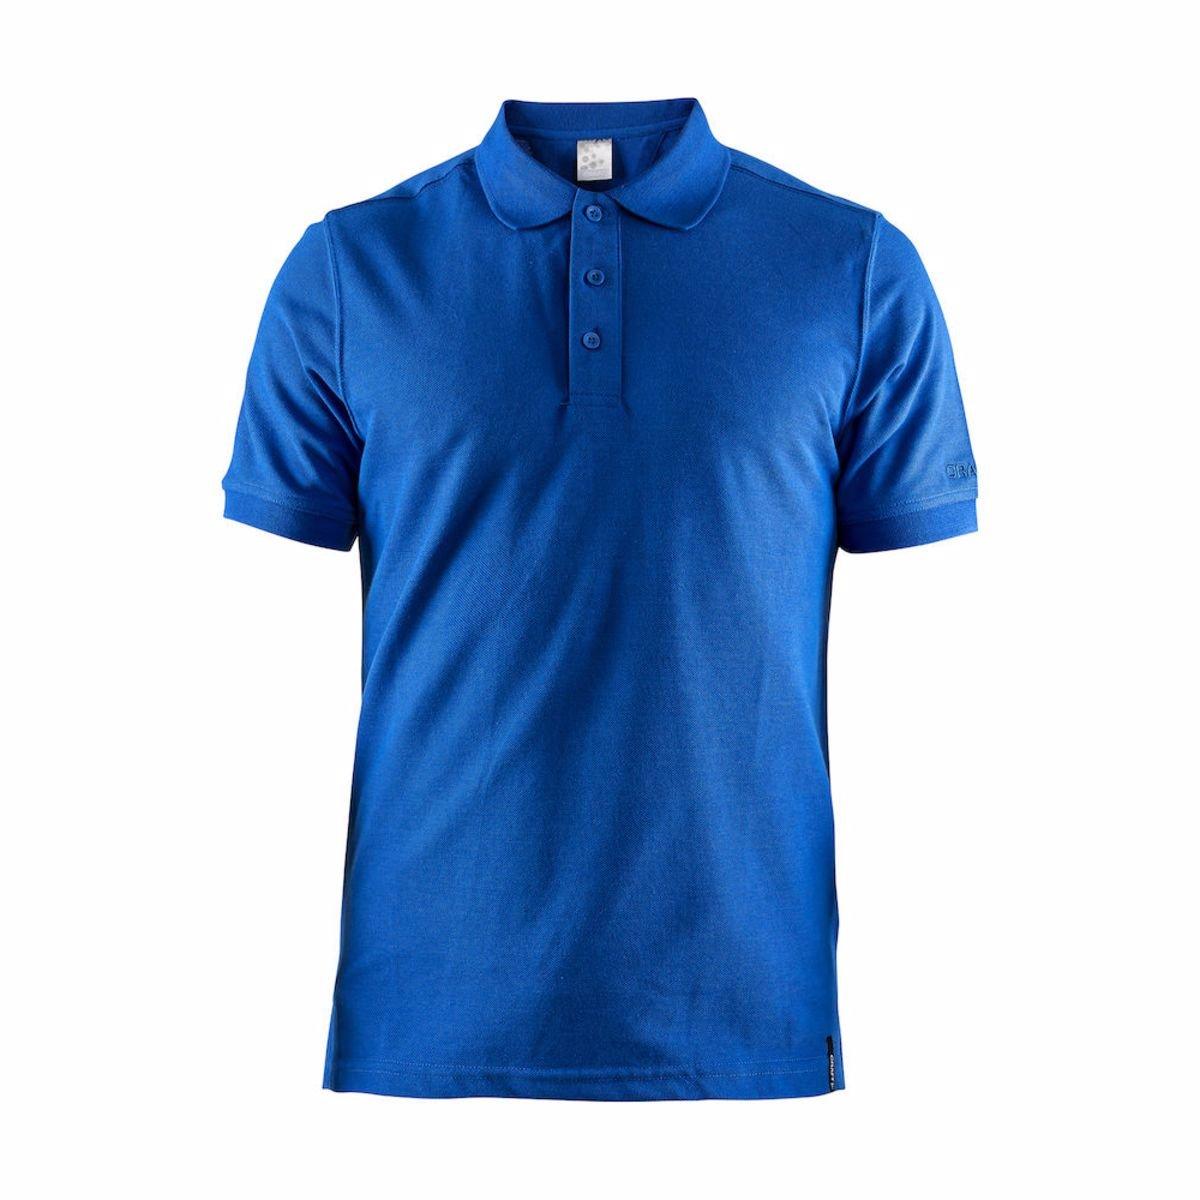 Craft Triko Casual Polo Pique modrá M